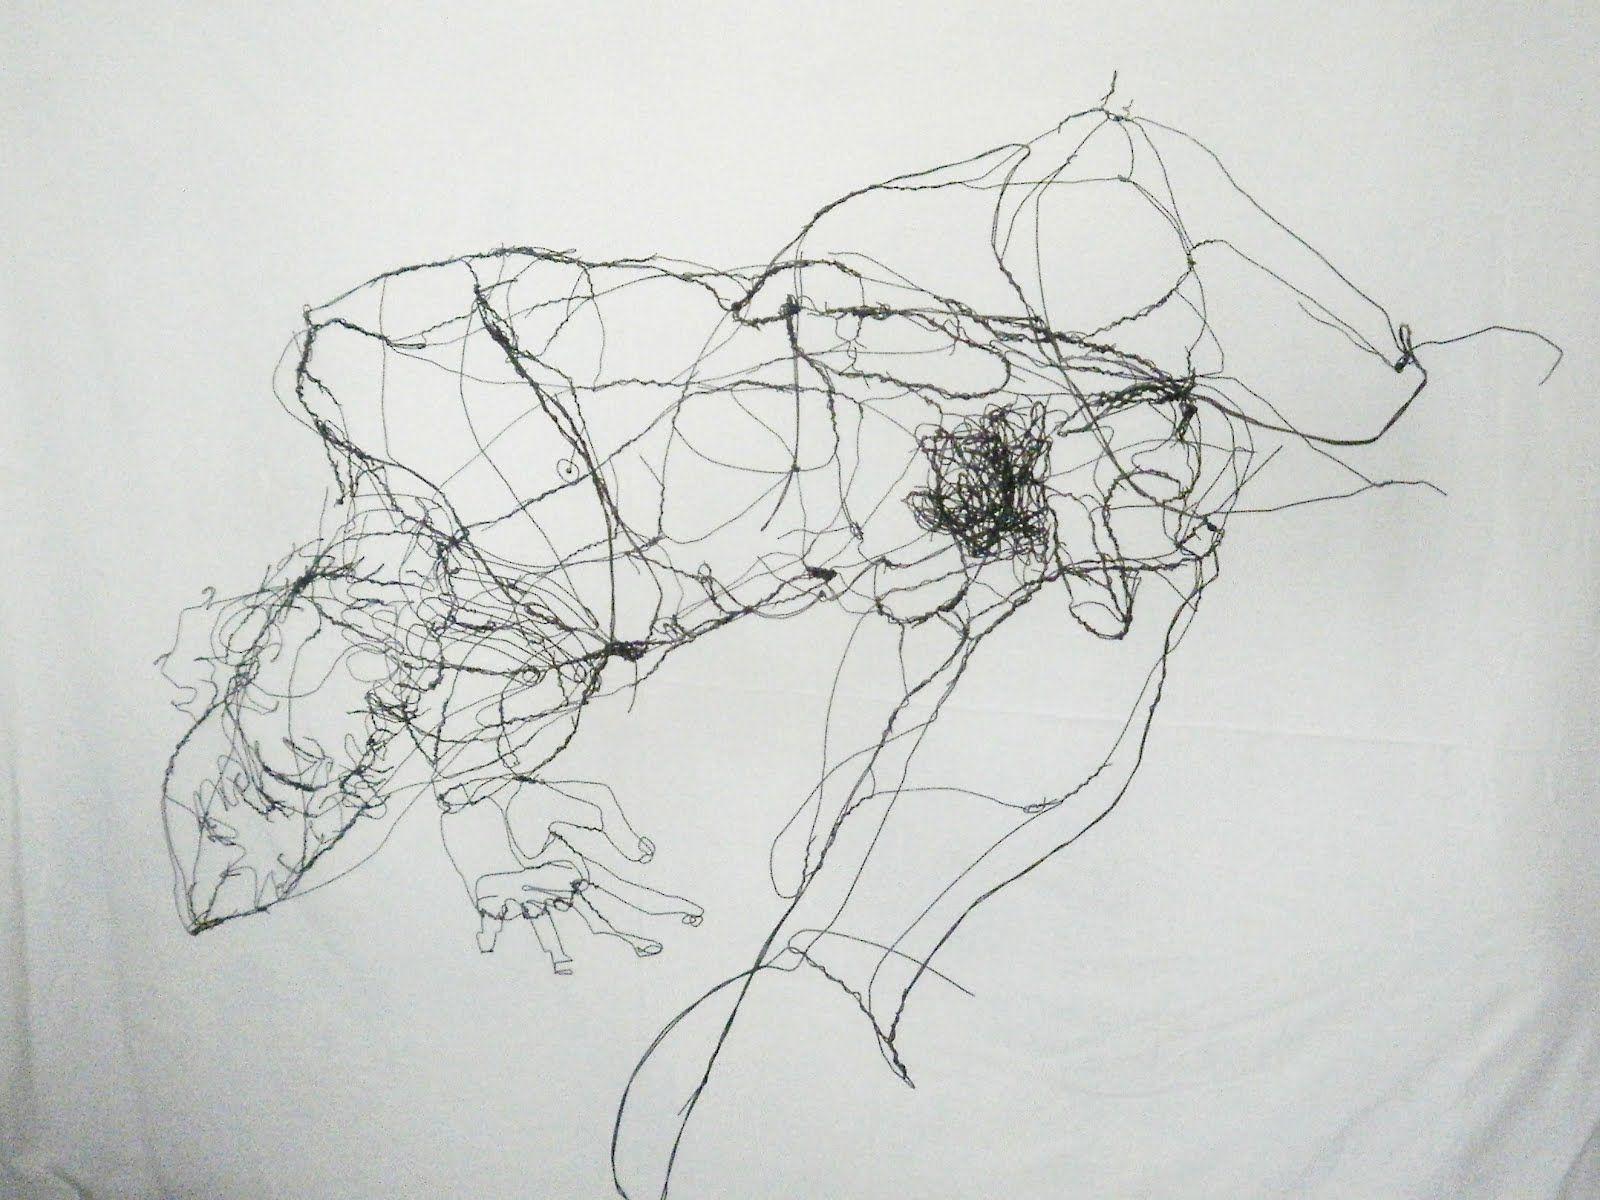 3d Line Drawings : It is a bit like egon schiele but then d david miguel oliveira